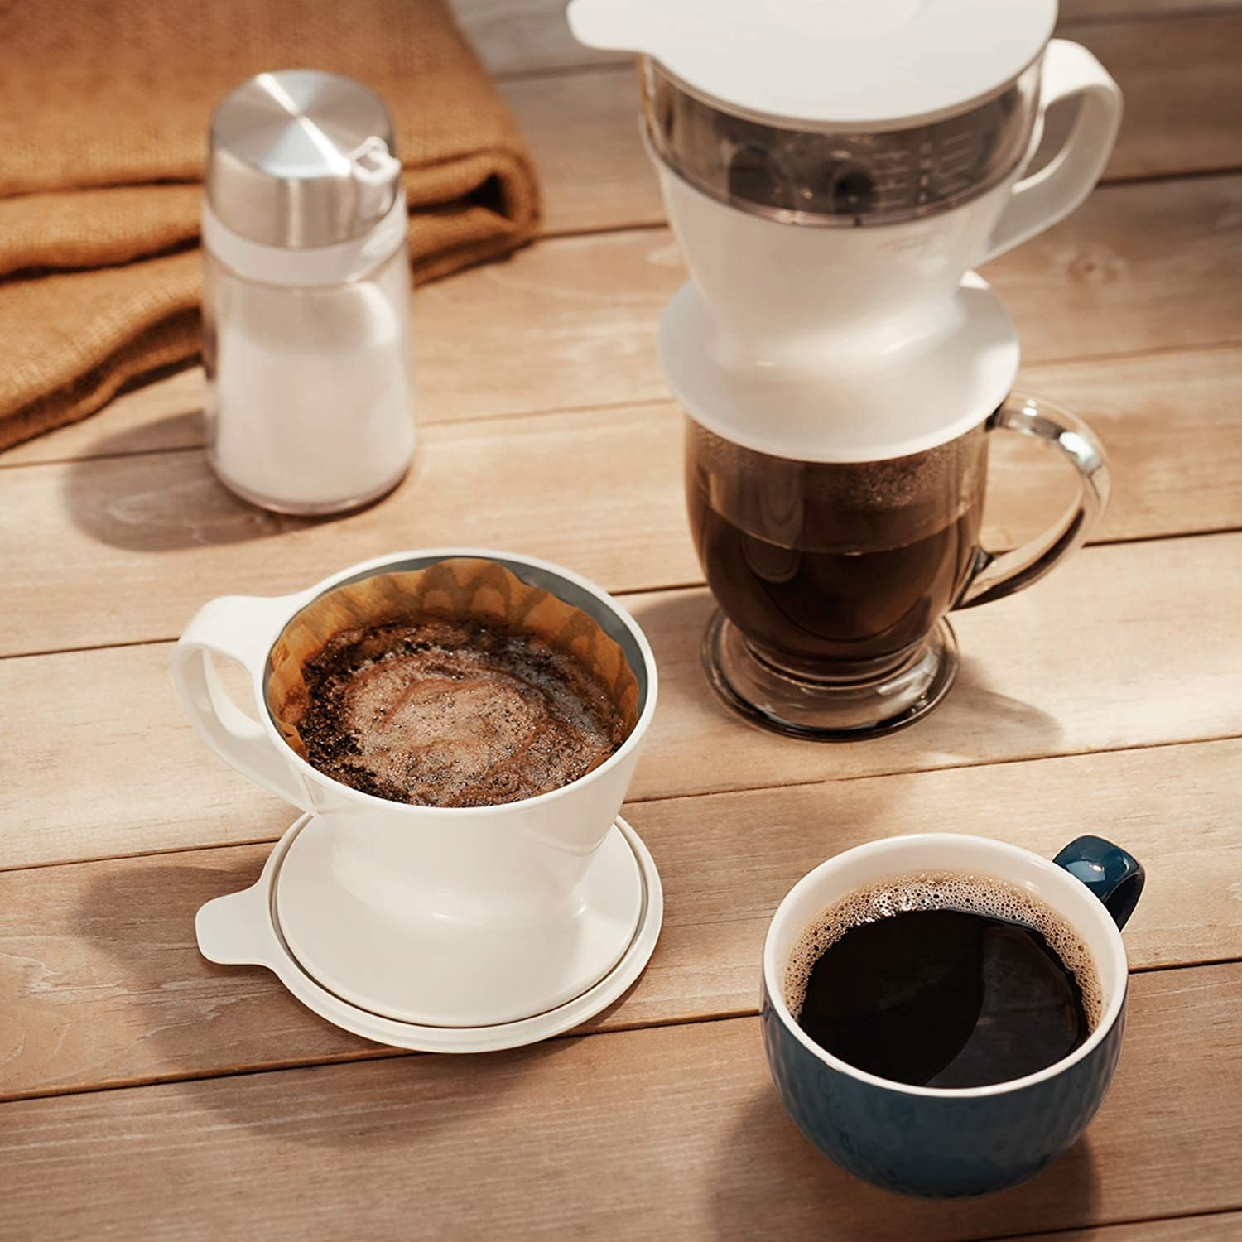 OXO(オクソー) オートドリップコーヒーメーカー 11180100の商品画像7